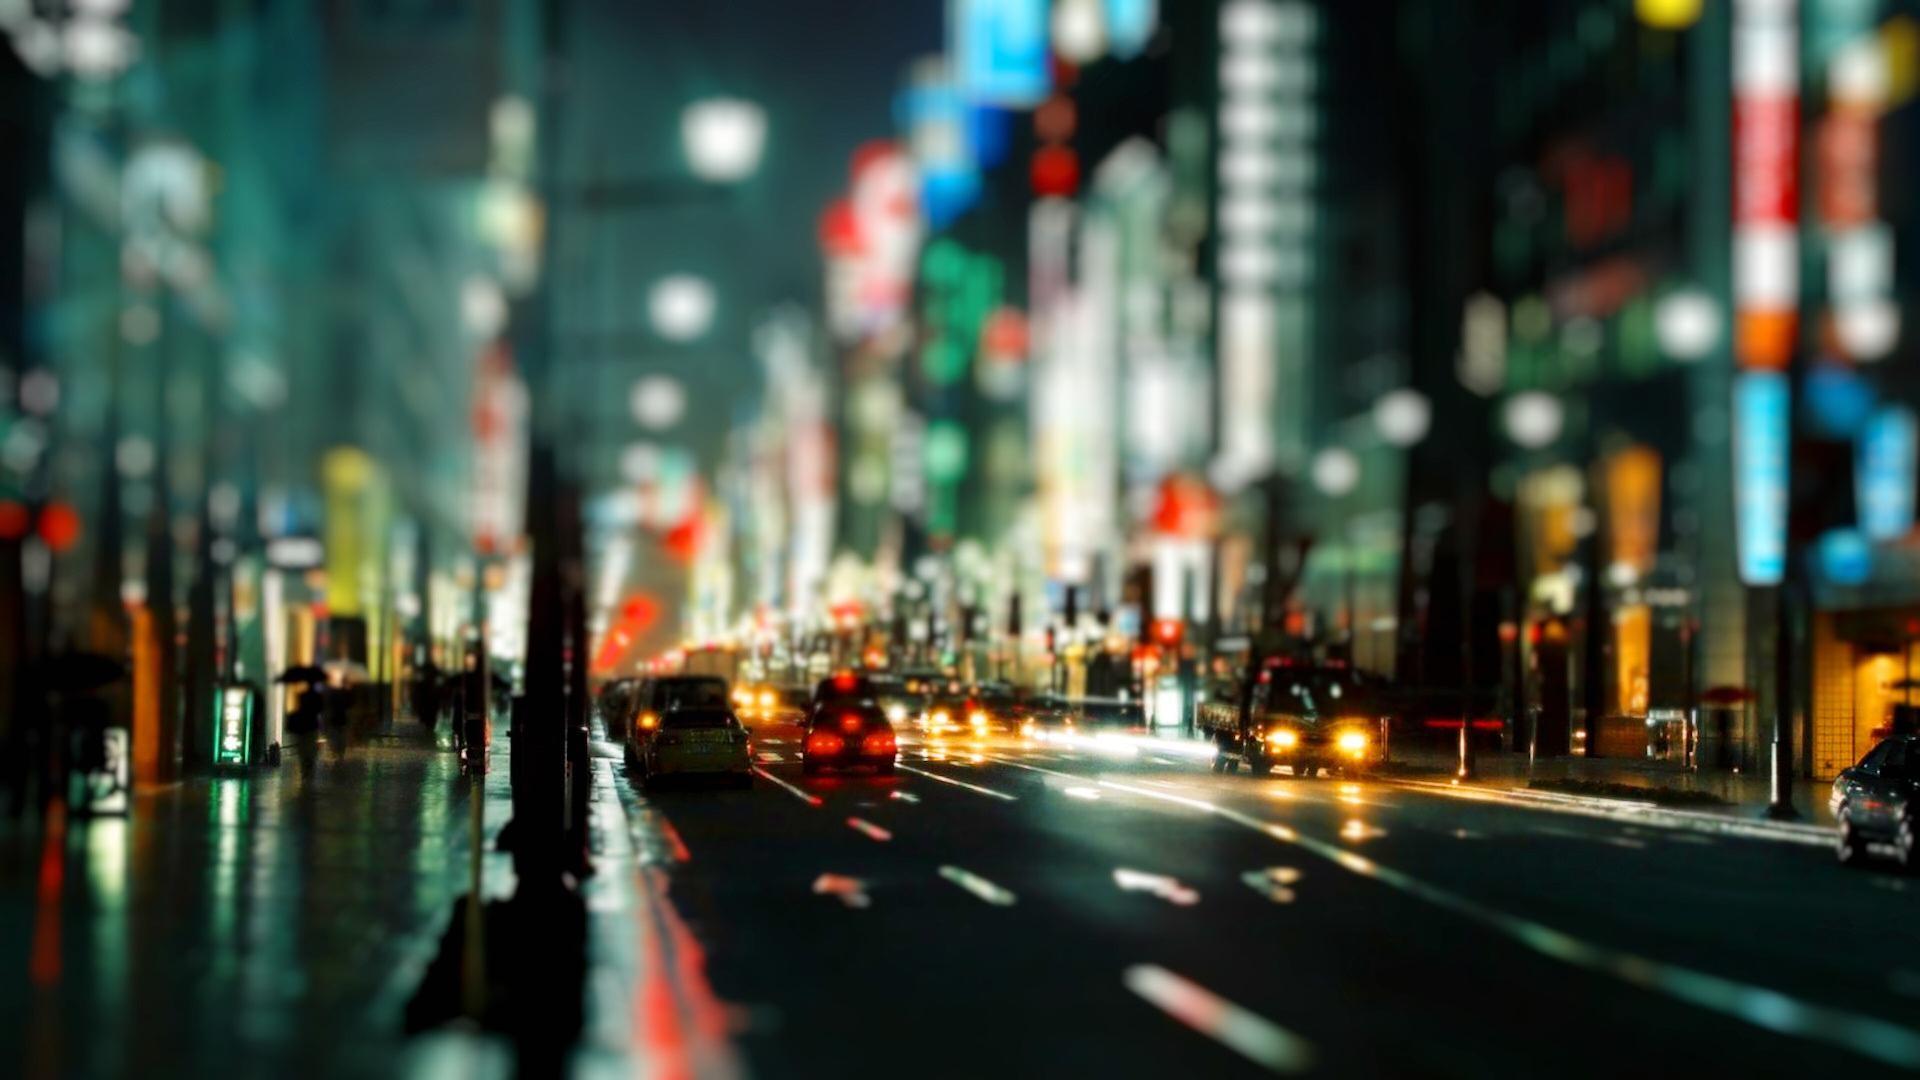 cityscapes,streets cityscapes streets rain cars urban buildings bokeh city  lights tiltshift depth of field nighttime u – Fields Wallpaper – Desktop …